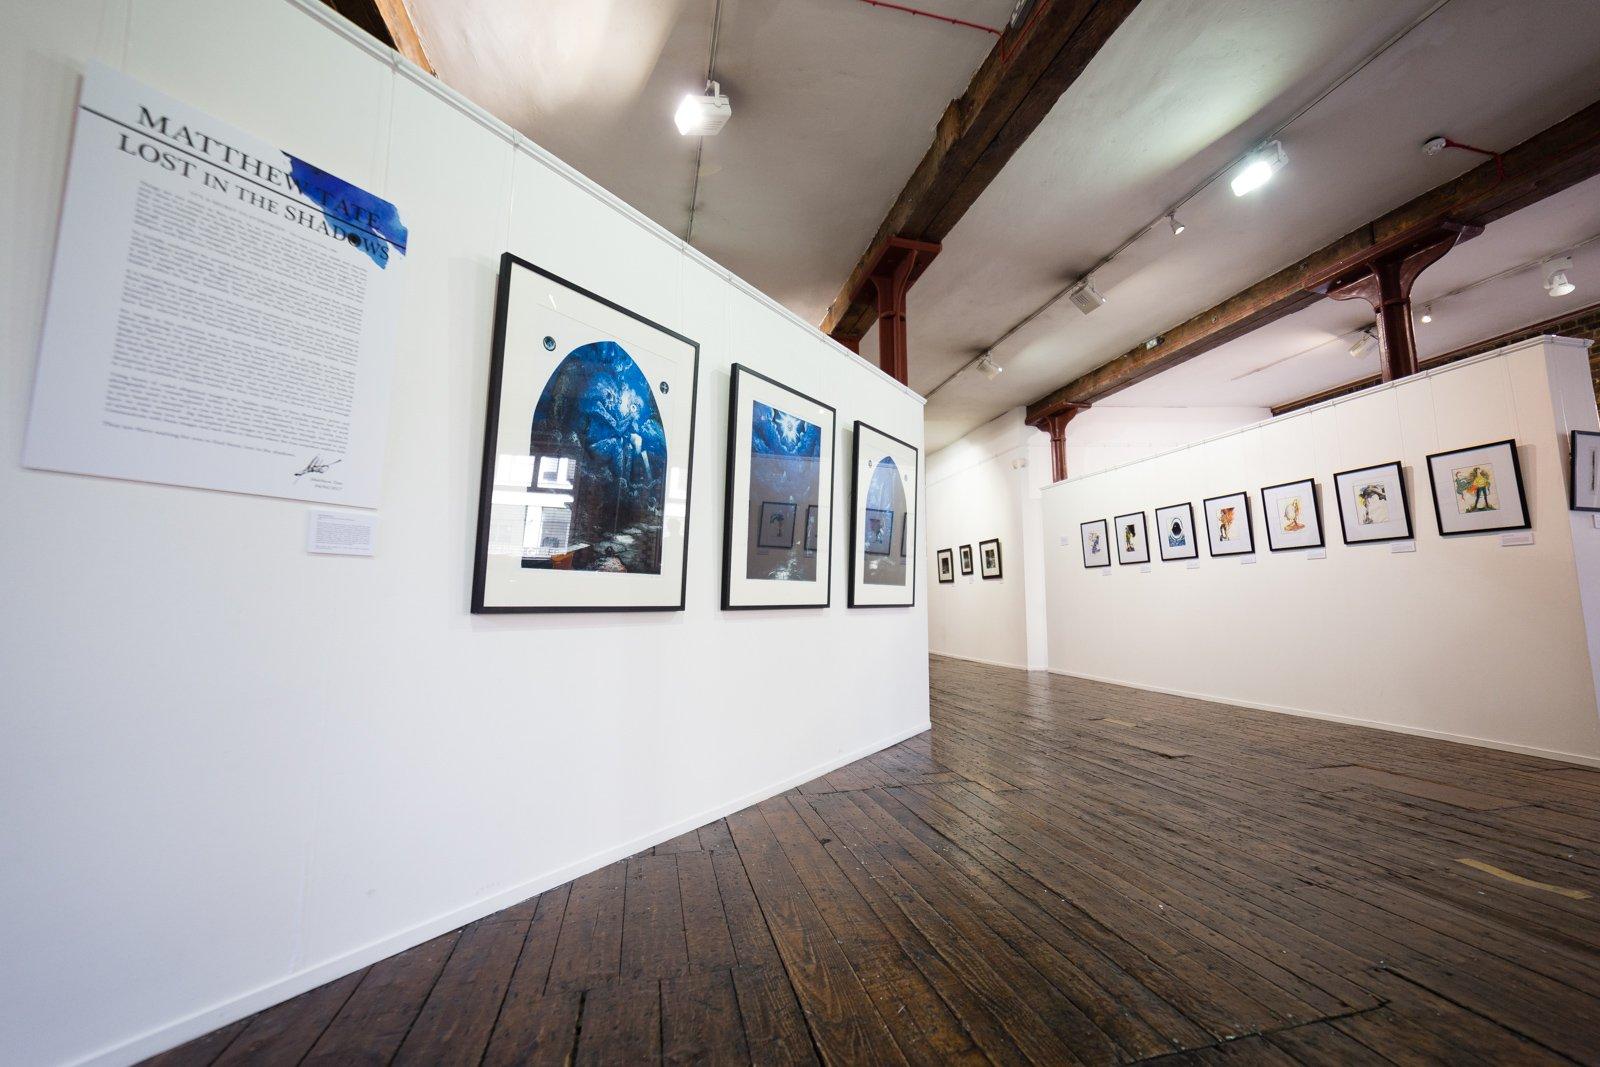 Chasing Shadows at the Menier Gallery